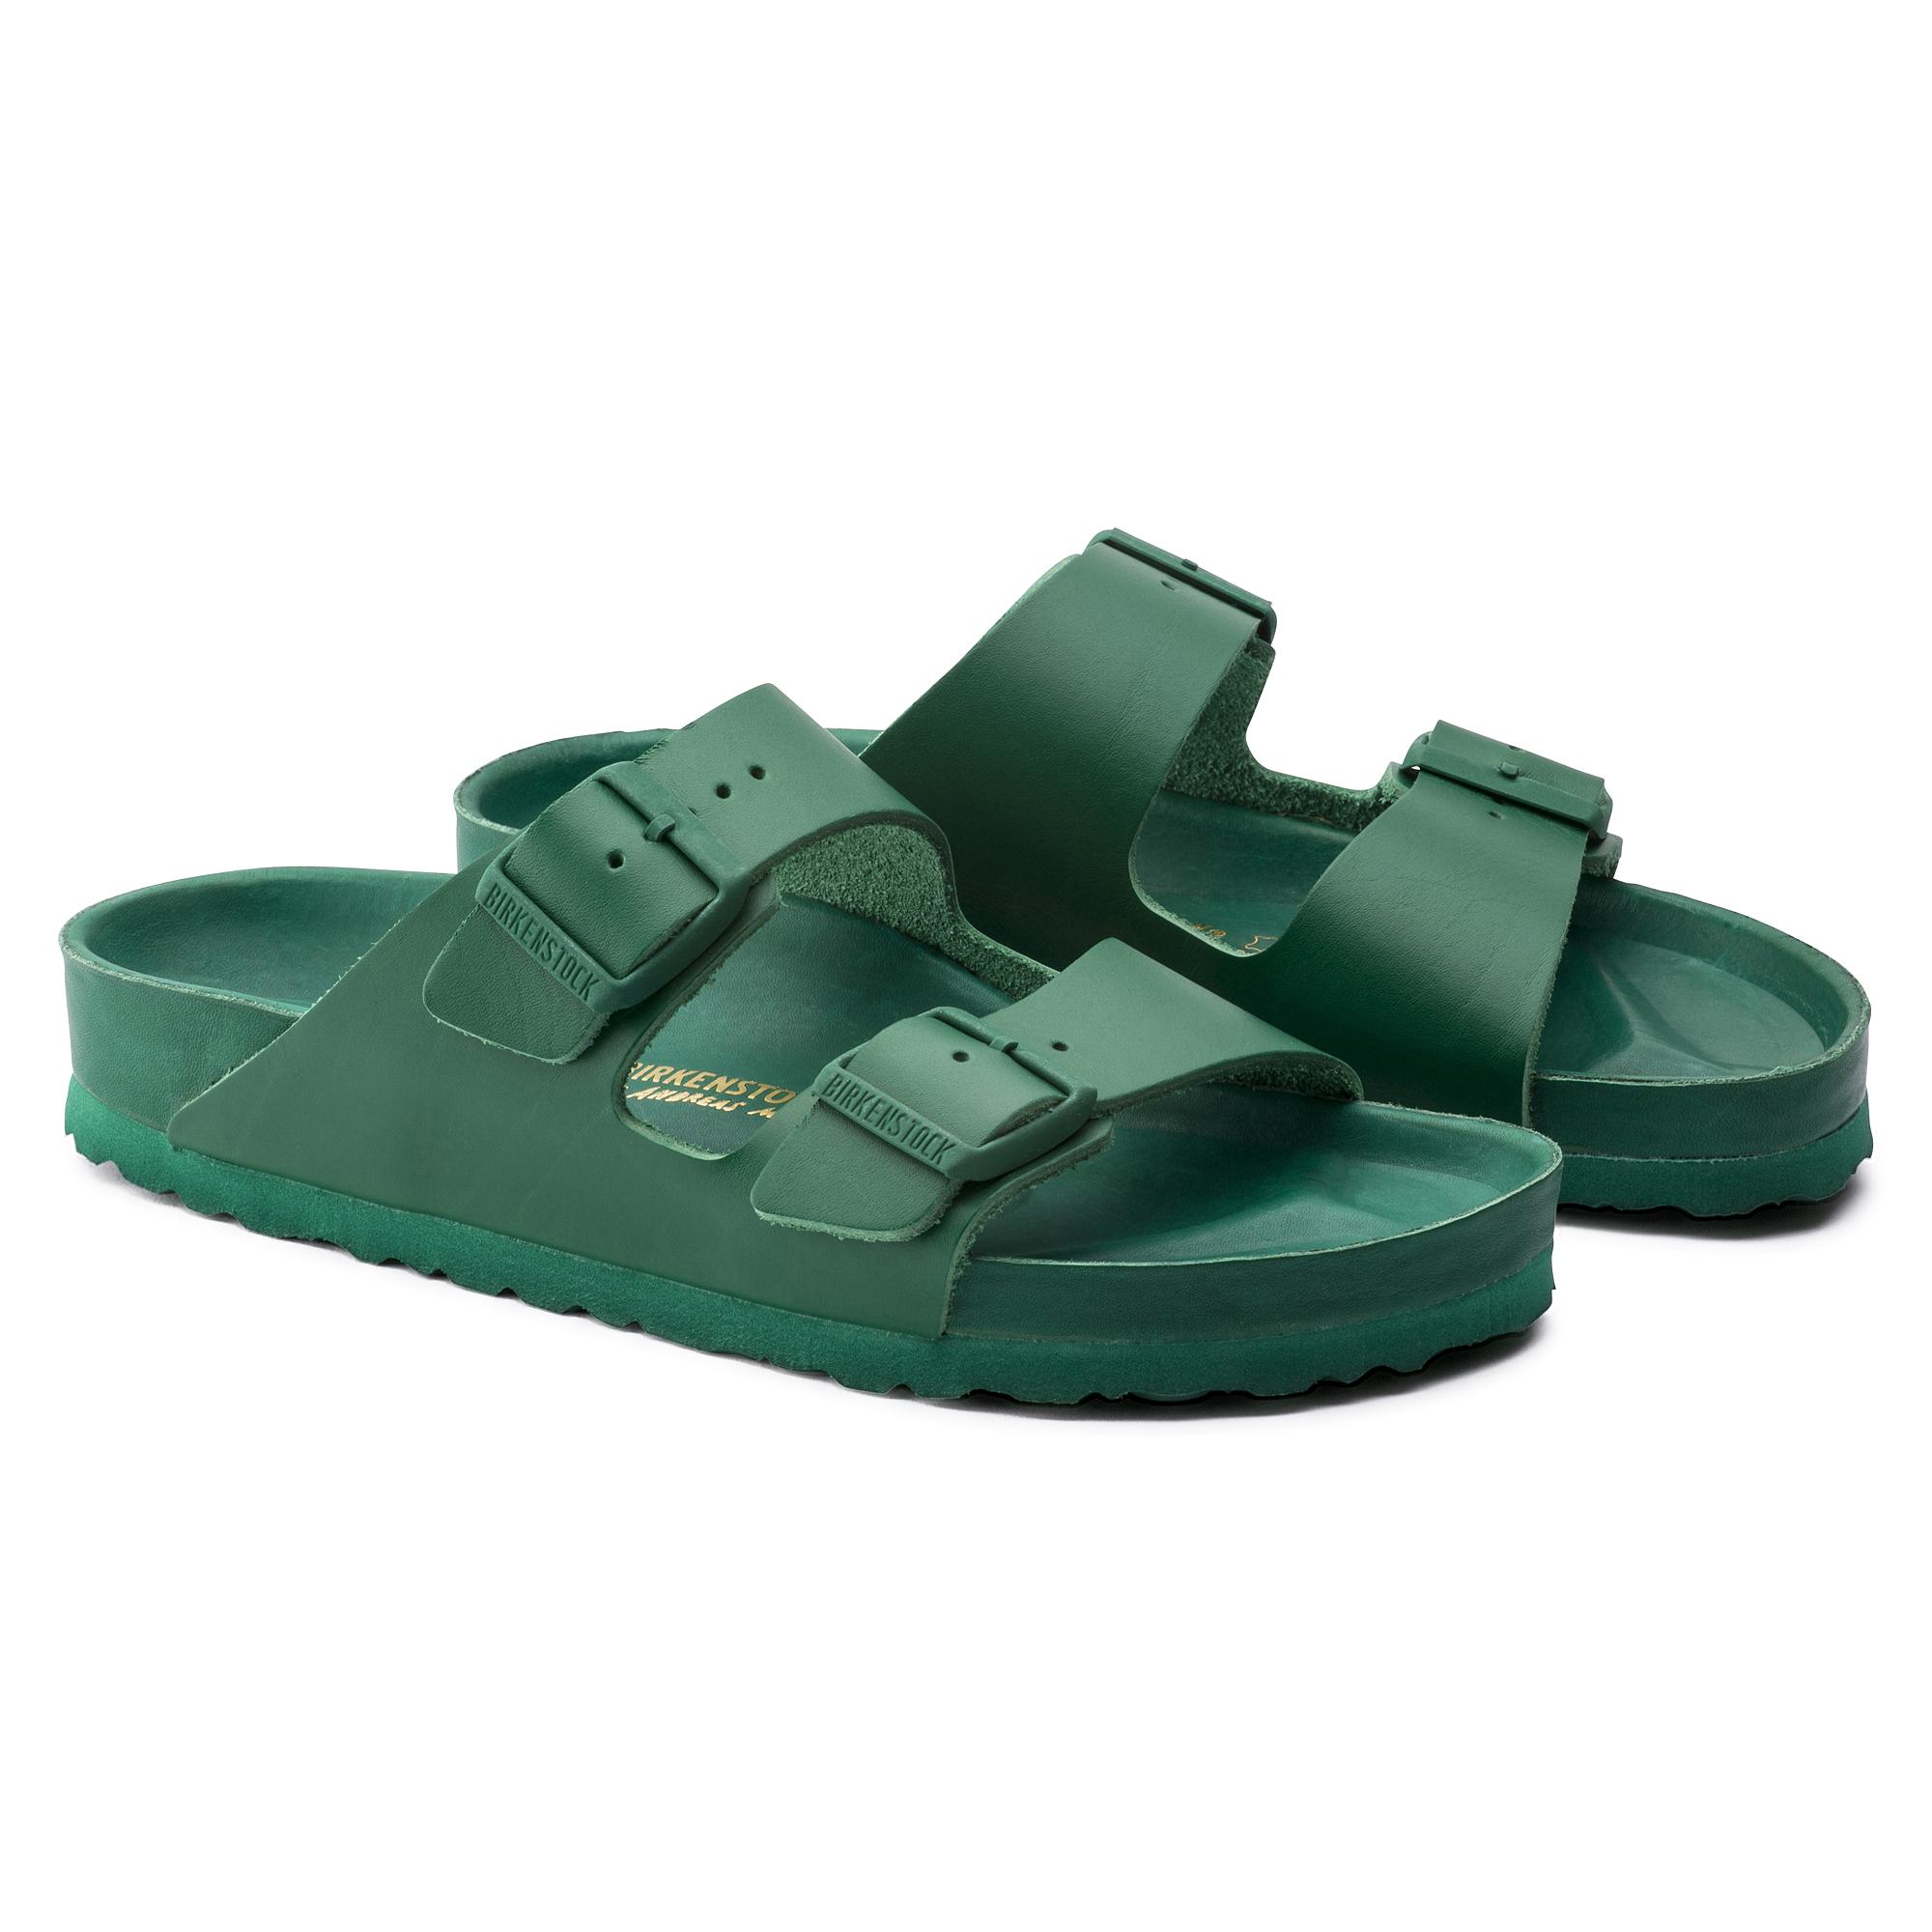 720d8f625 Arizona Natural Leather Green | shop online at BIRKENSTOCK